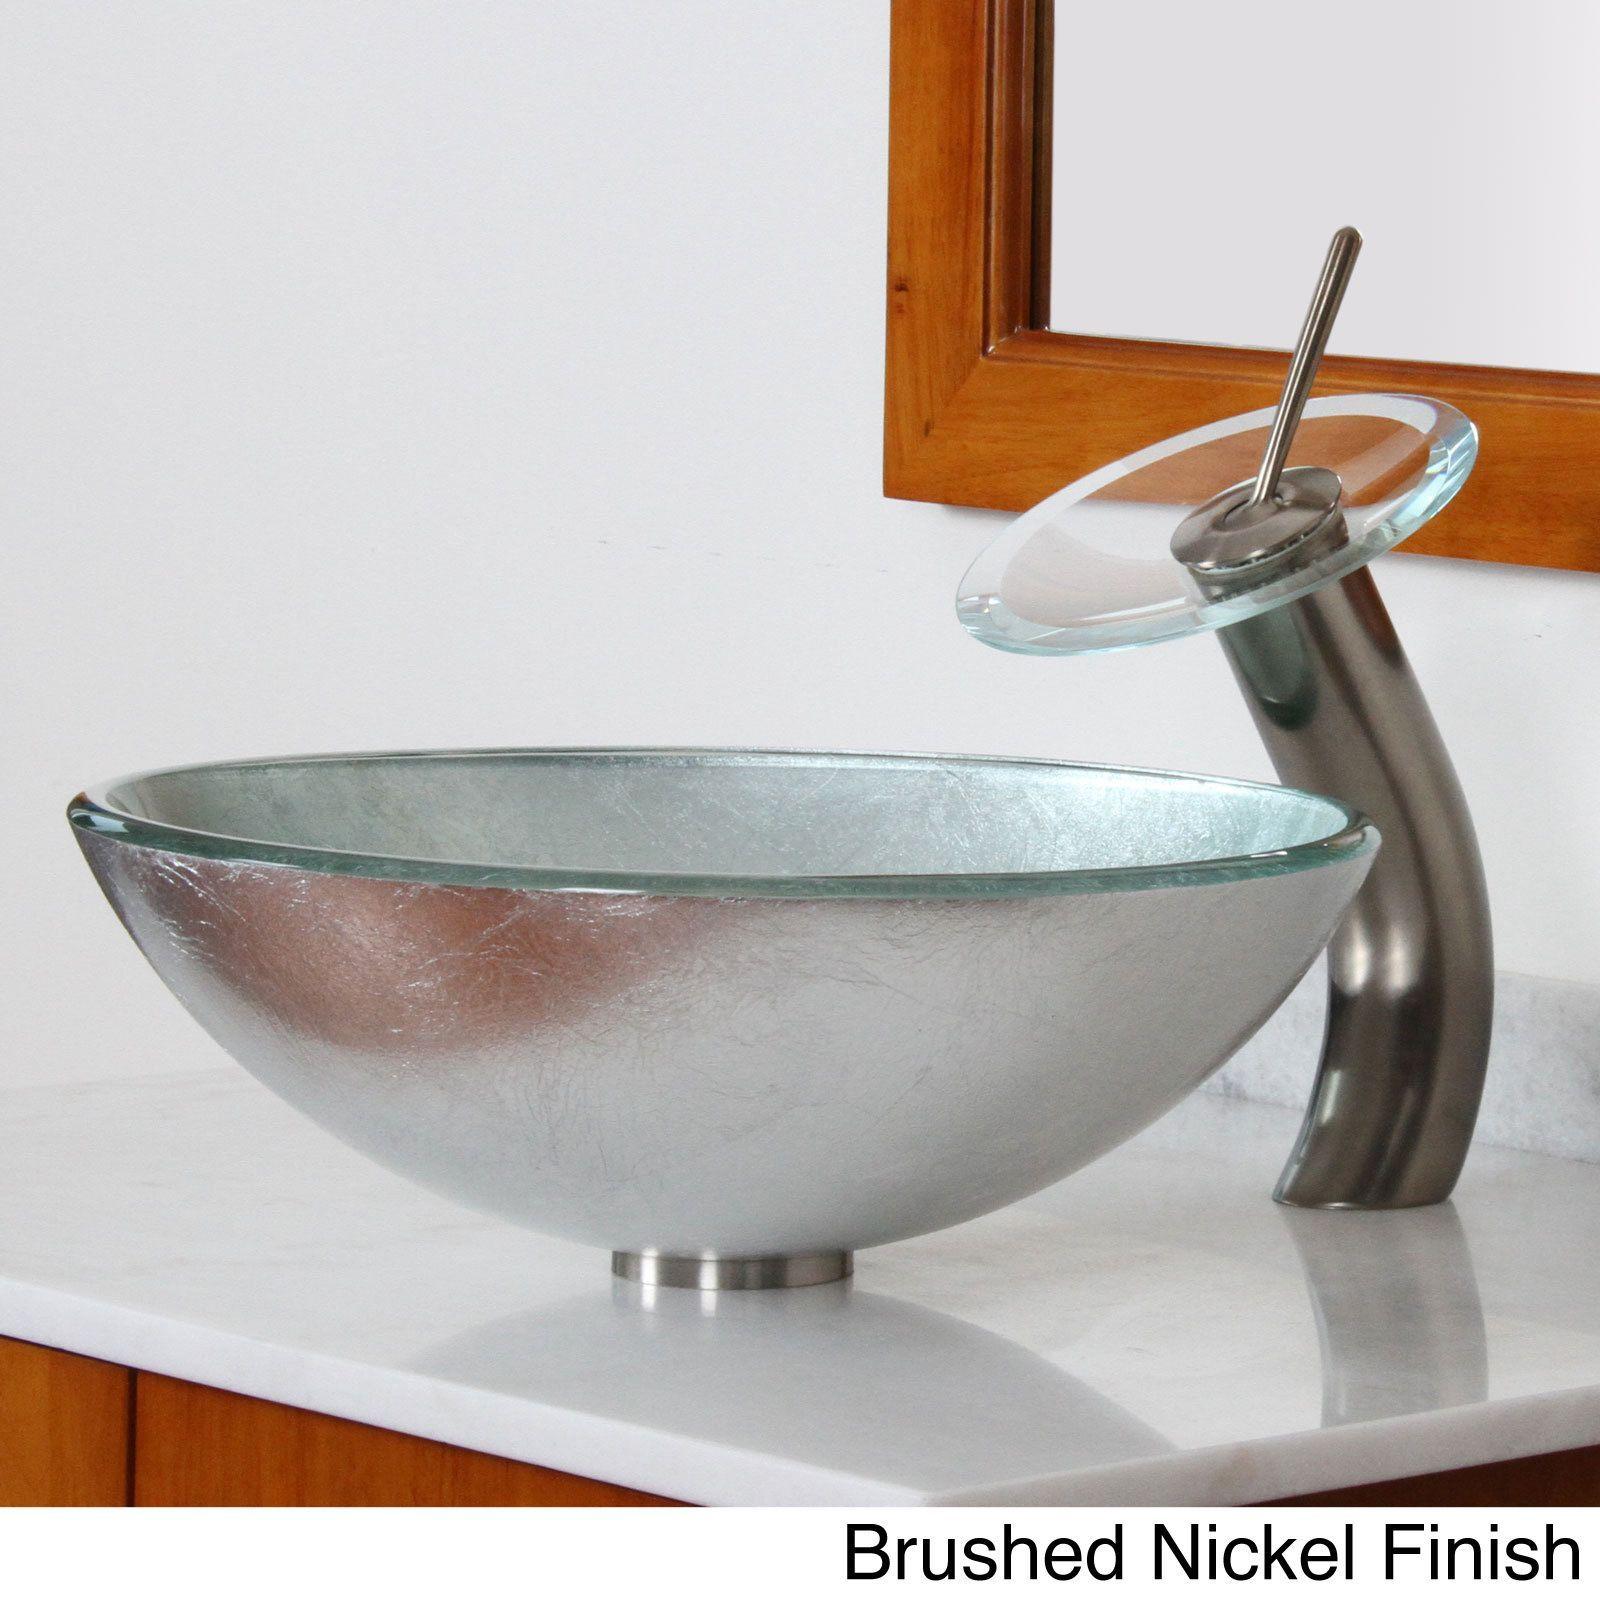 Elite Modern Tempered Glass Bathroom Vessel Sink with Wrinkles ...